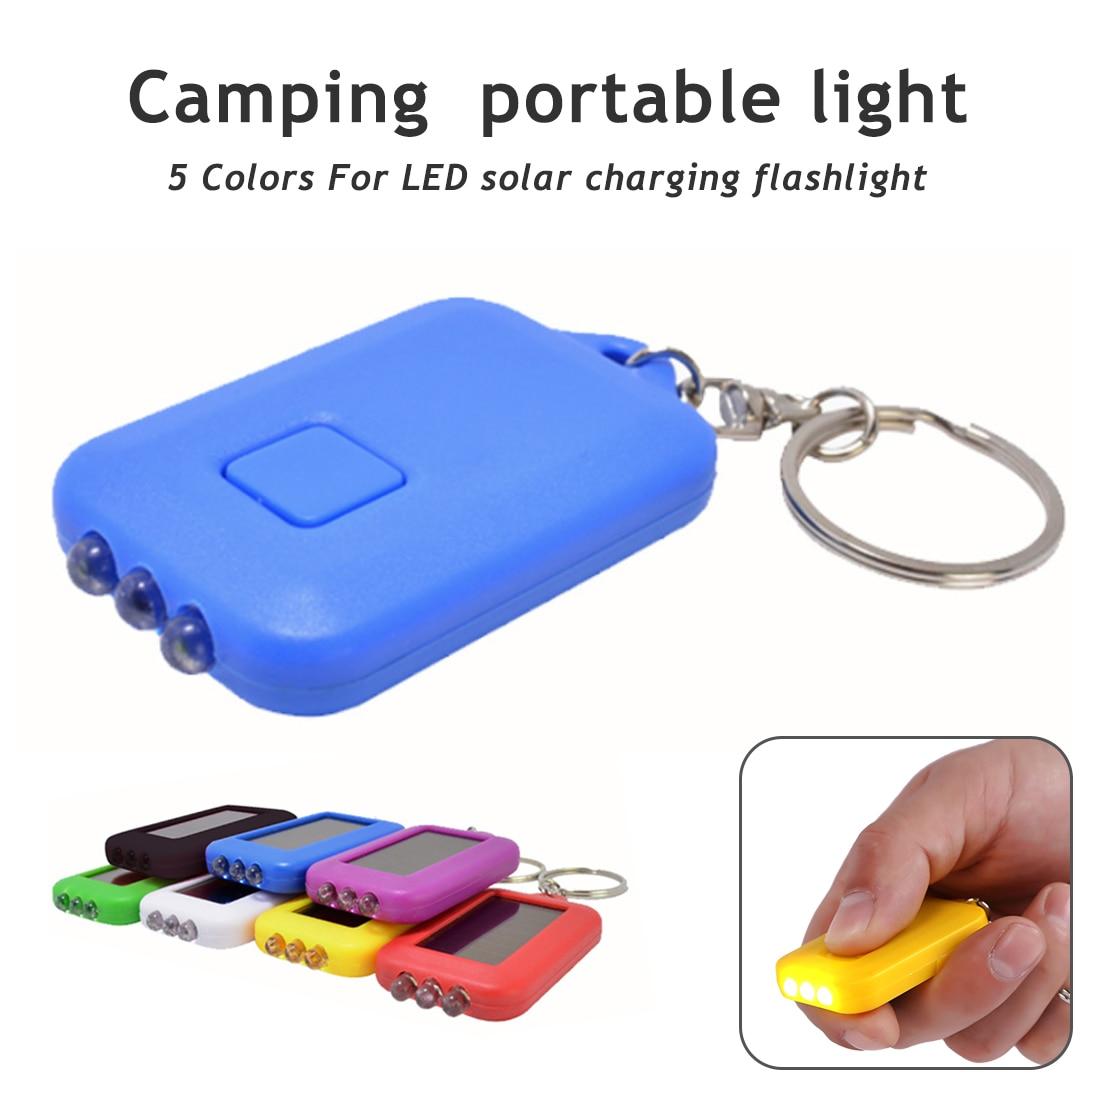 5.9cm*3.5cm*1.1cm 3 Led Light  Solar  Flashlight Keychain Portable Light Torch Key Chain Emergency Camping Lamp Backpack Light